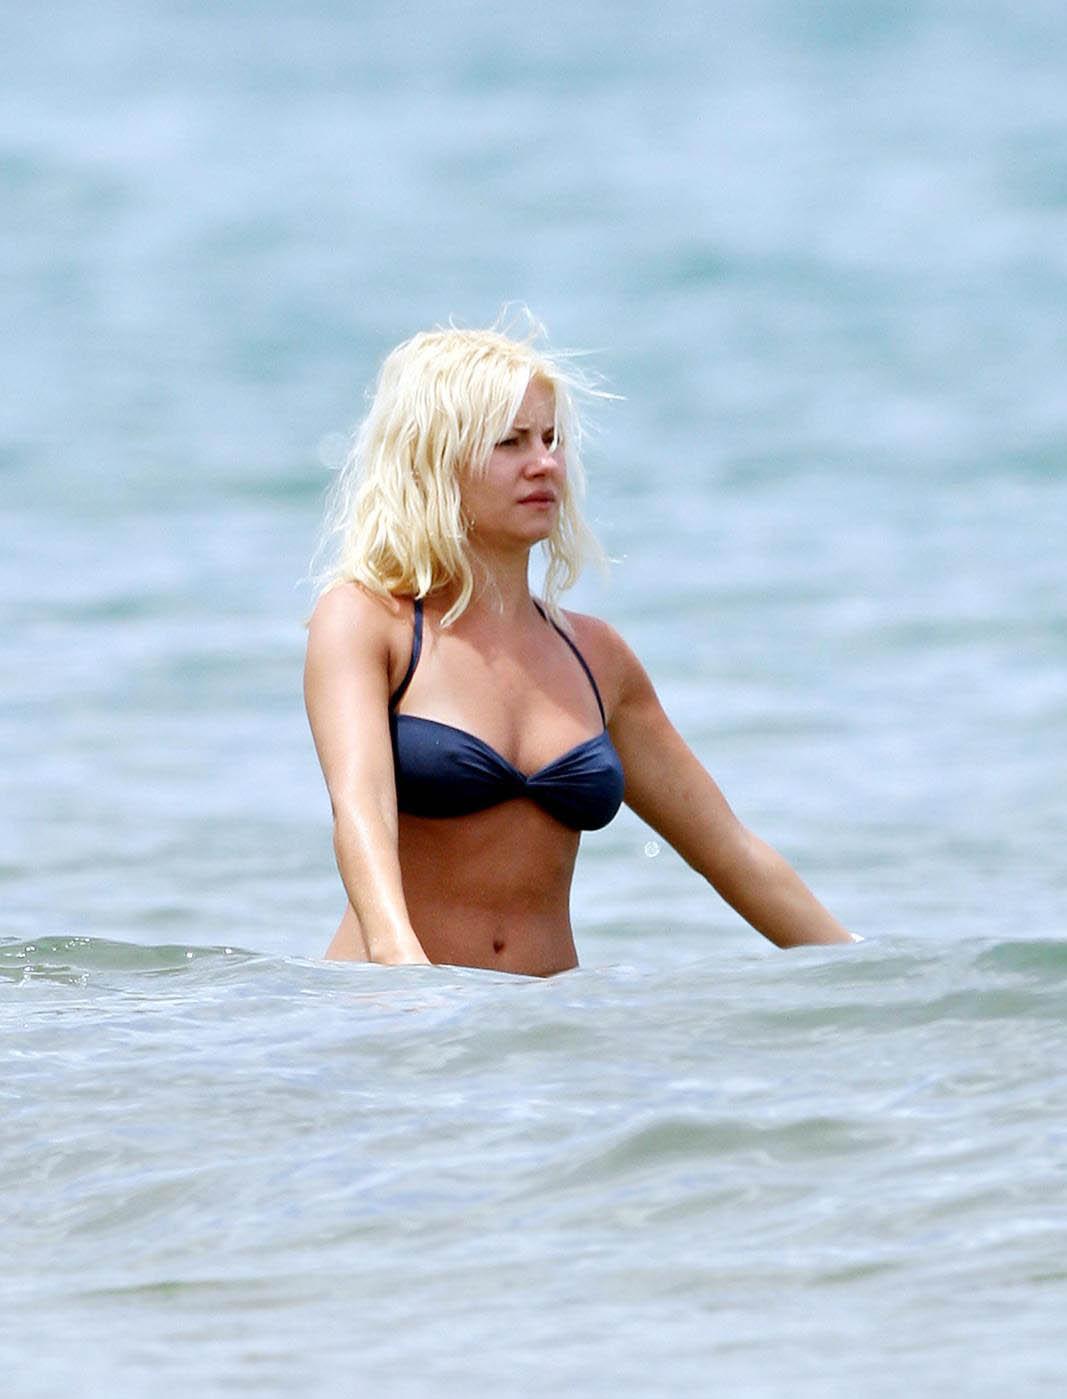 wallpapershdsize: Exclusive Elisha Cuthbert Bikini Pictures